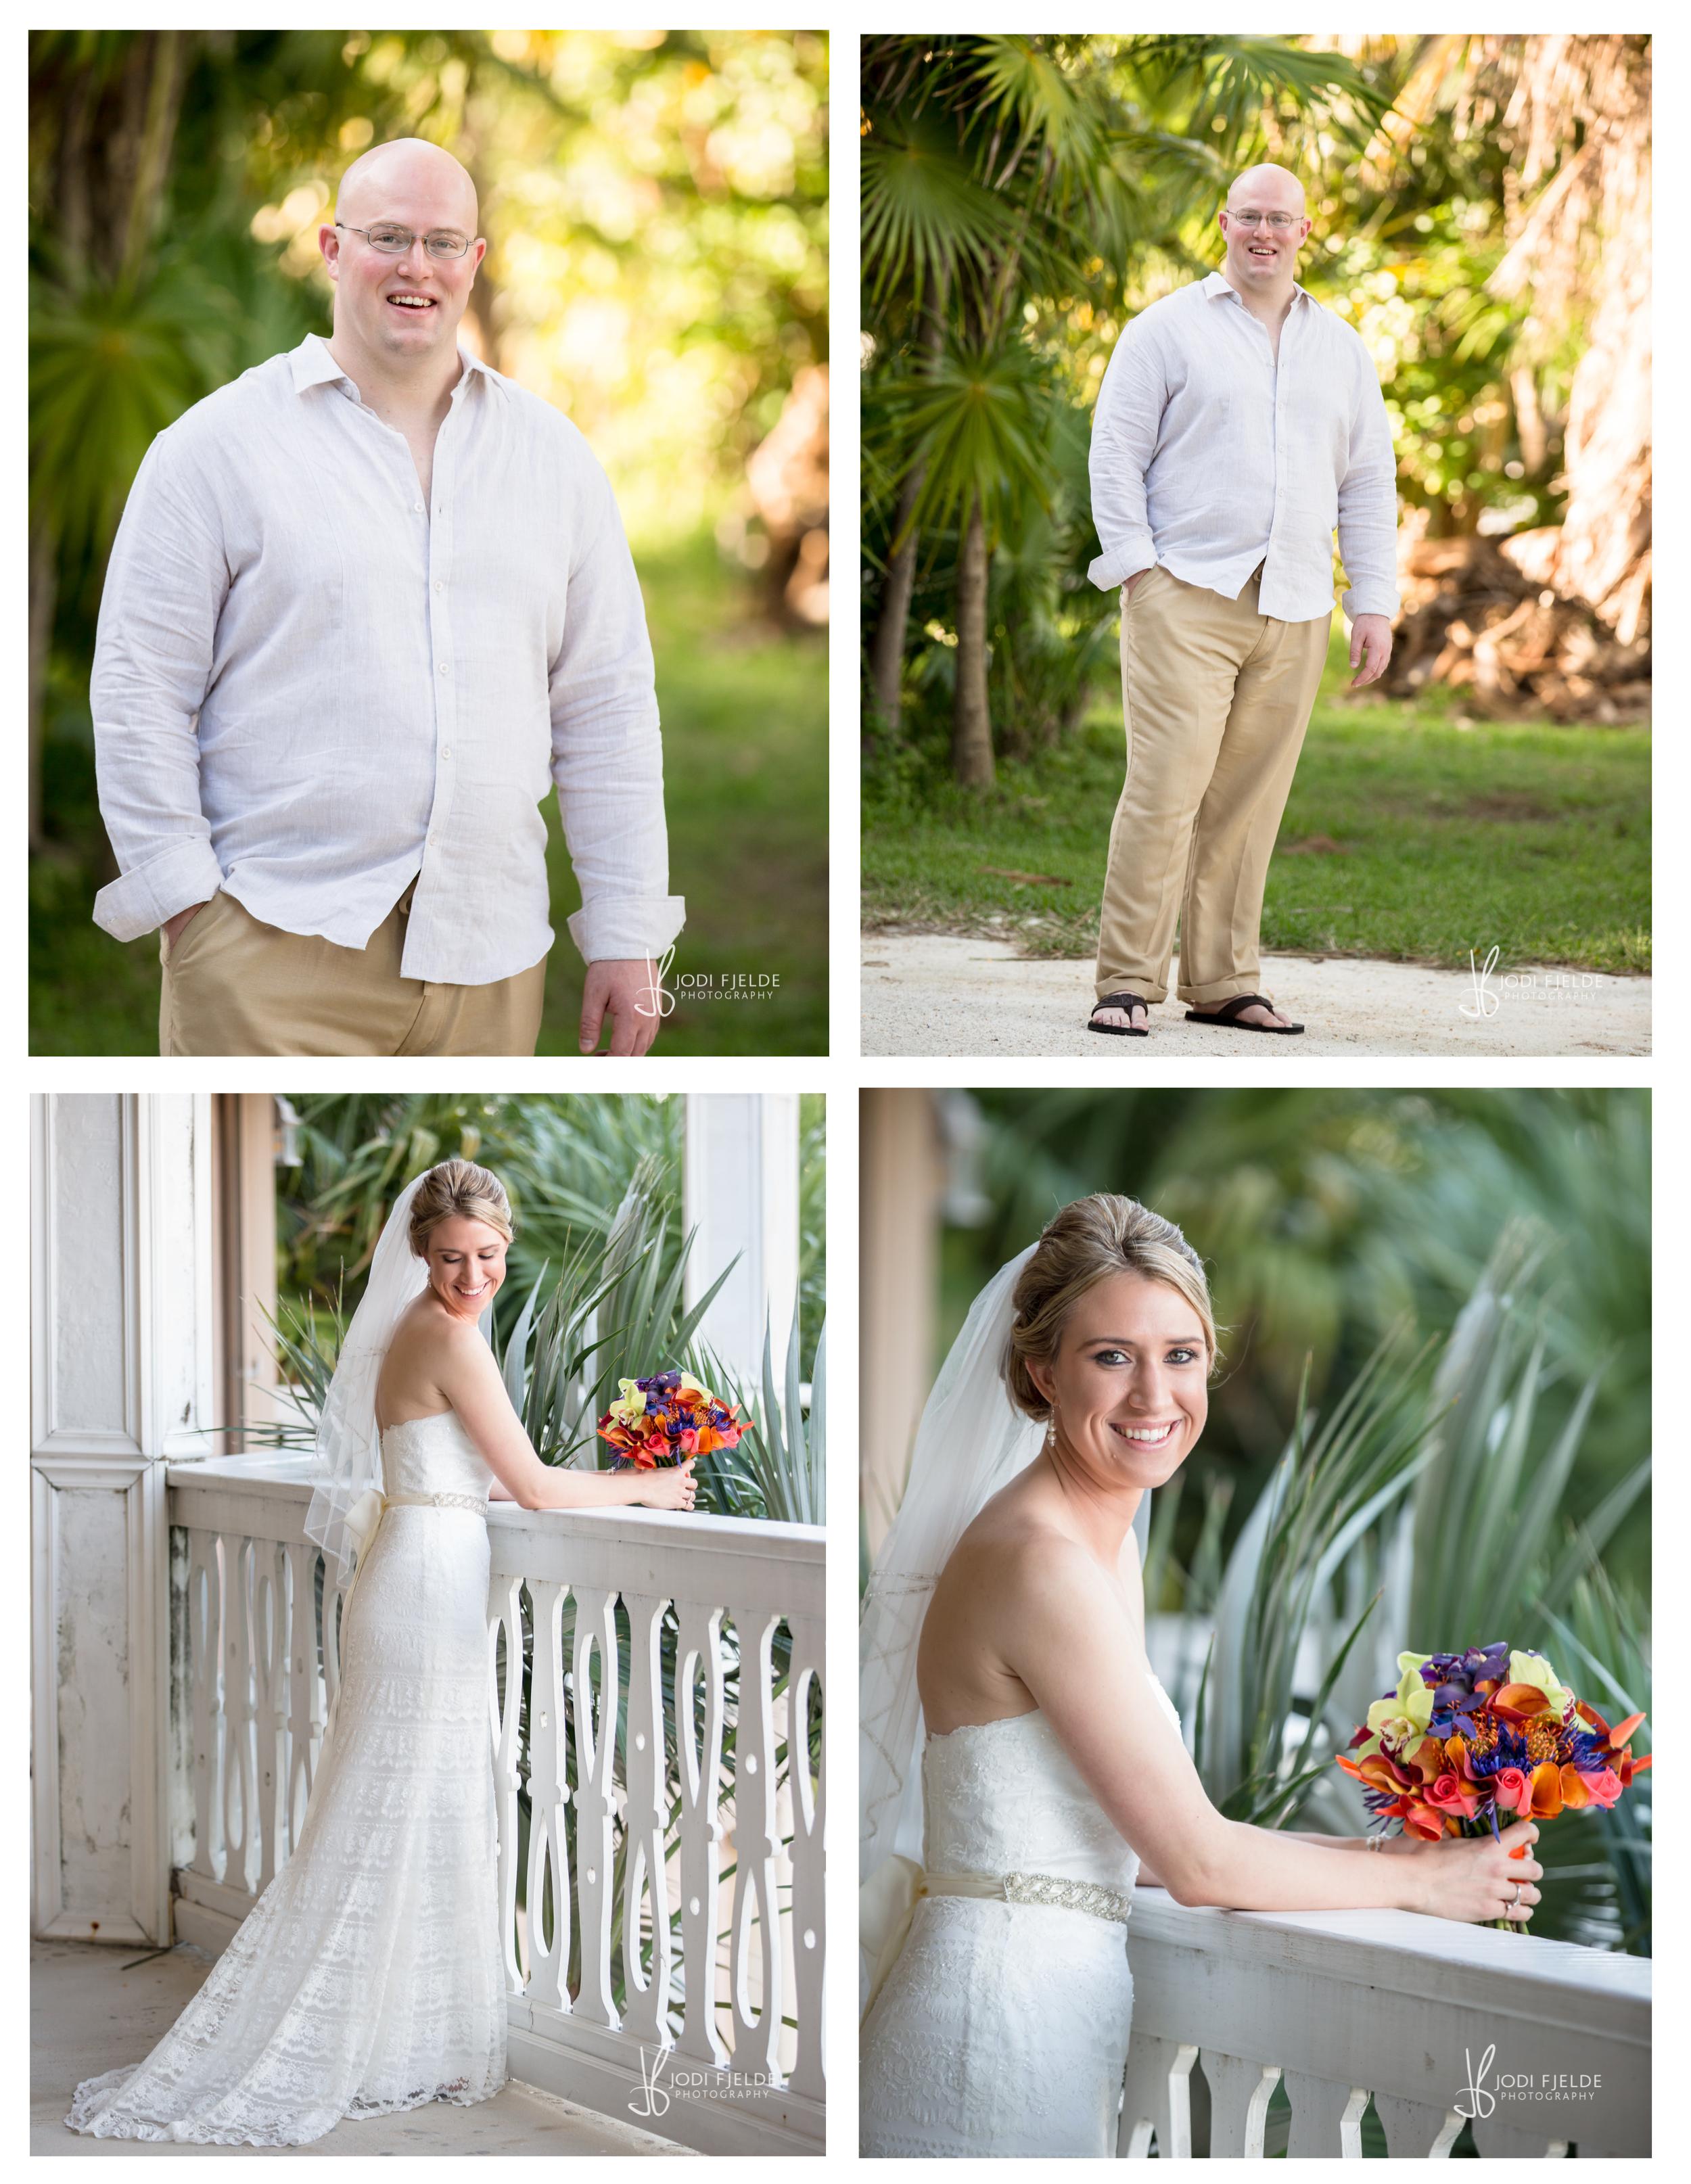 Cocconut_Cove_&_ Marina_ wedding_Kayla_and_Patrick 11.jpg